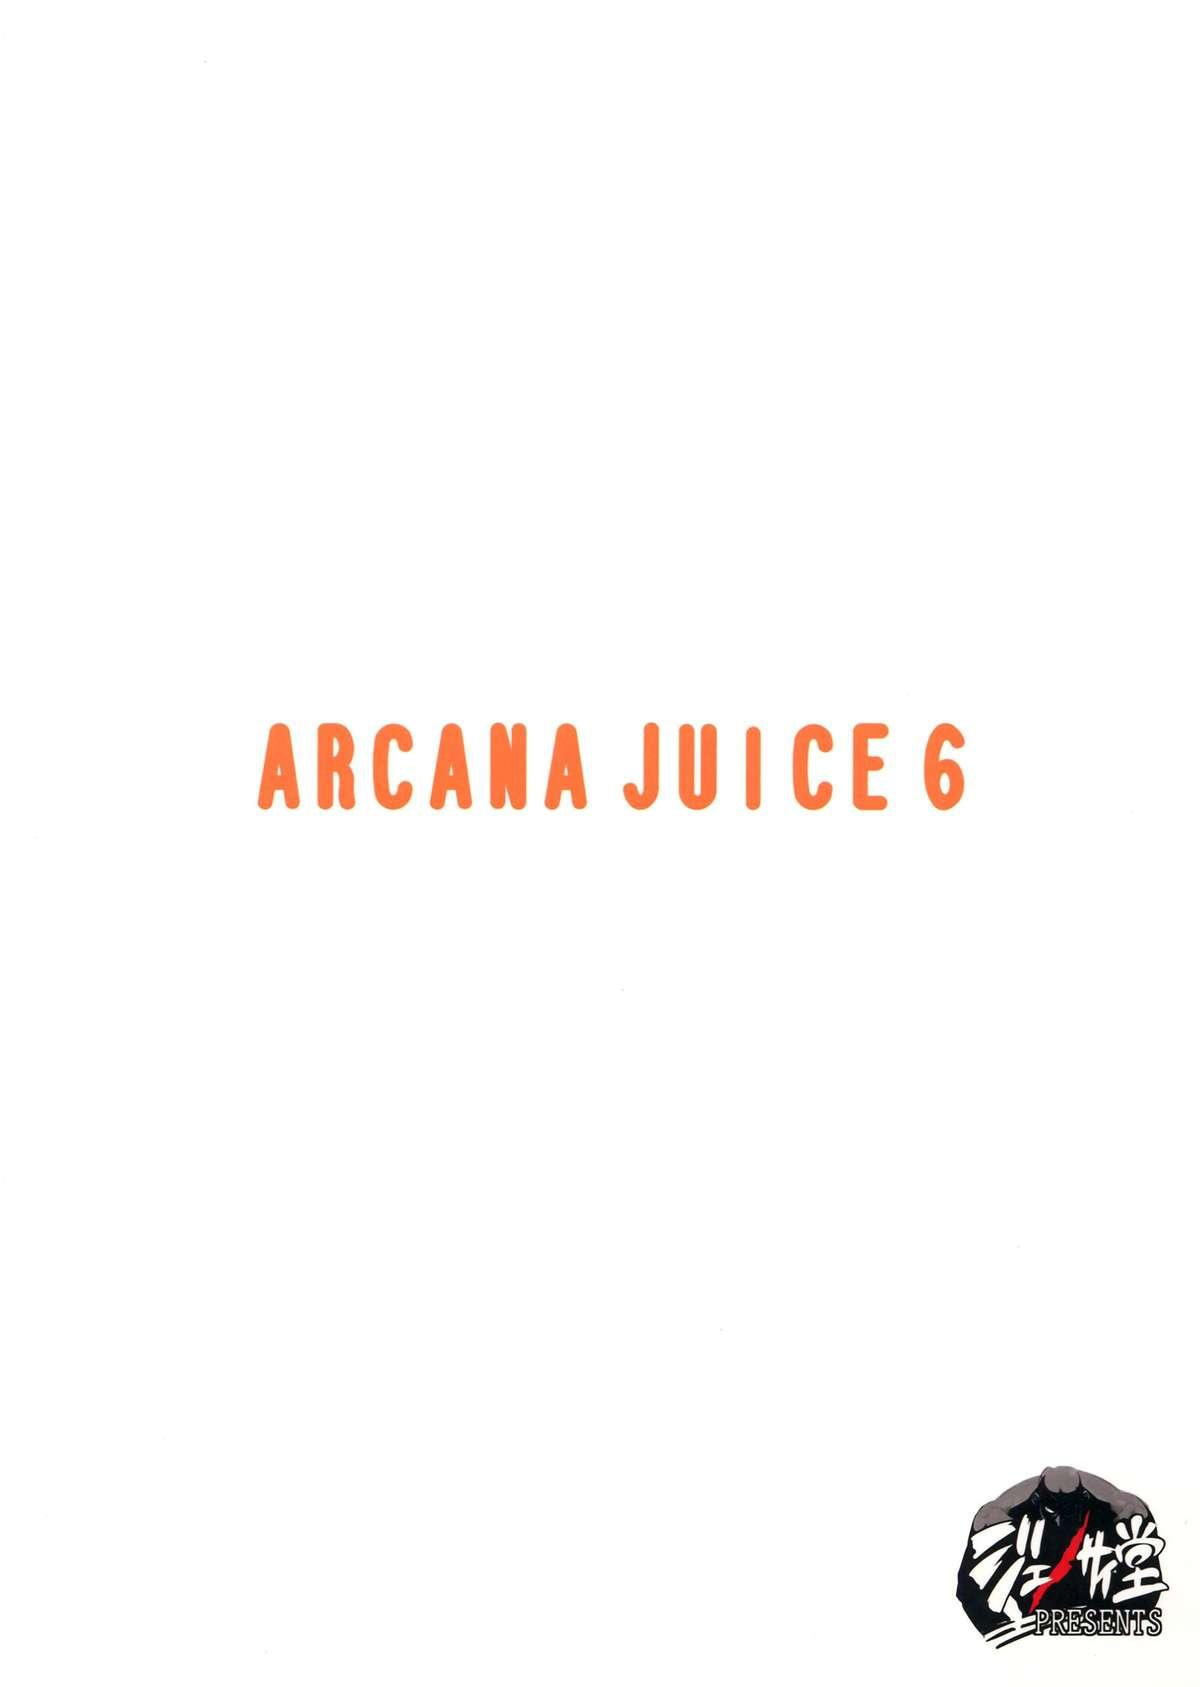 ARCANA JUICE 6 23